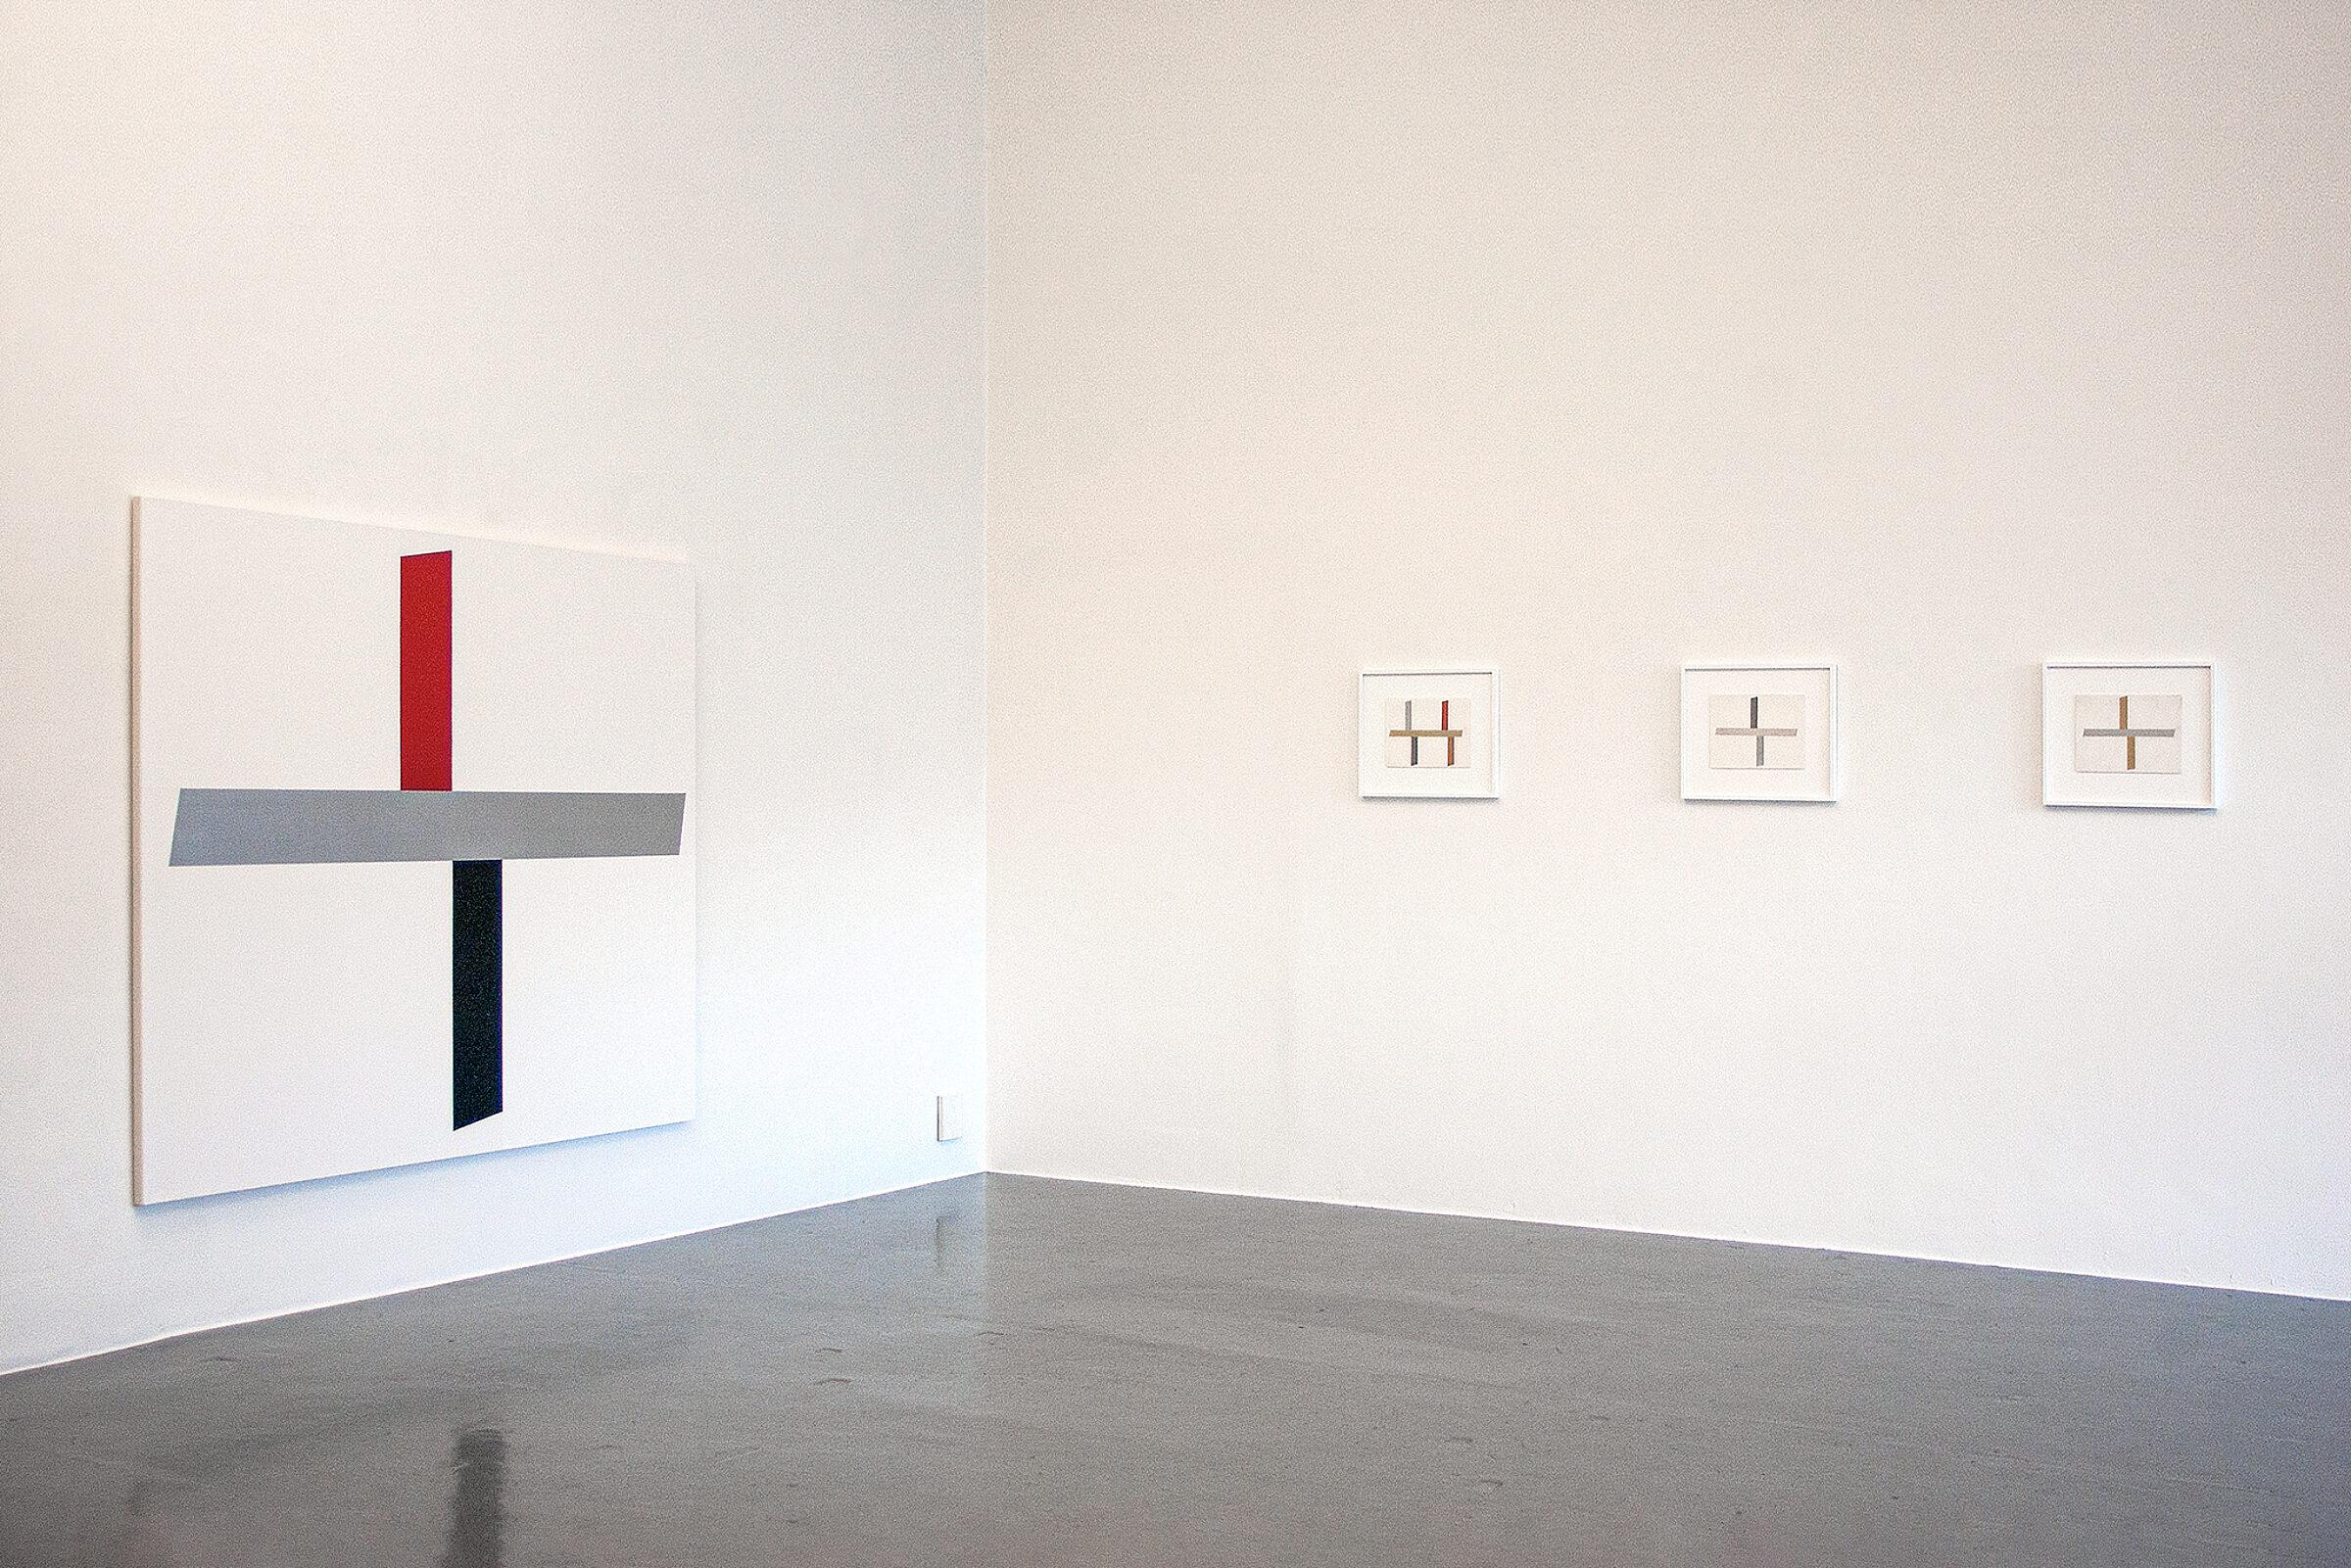 Alan-Uglow-Galerie-Onrust-EX-2010-01